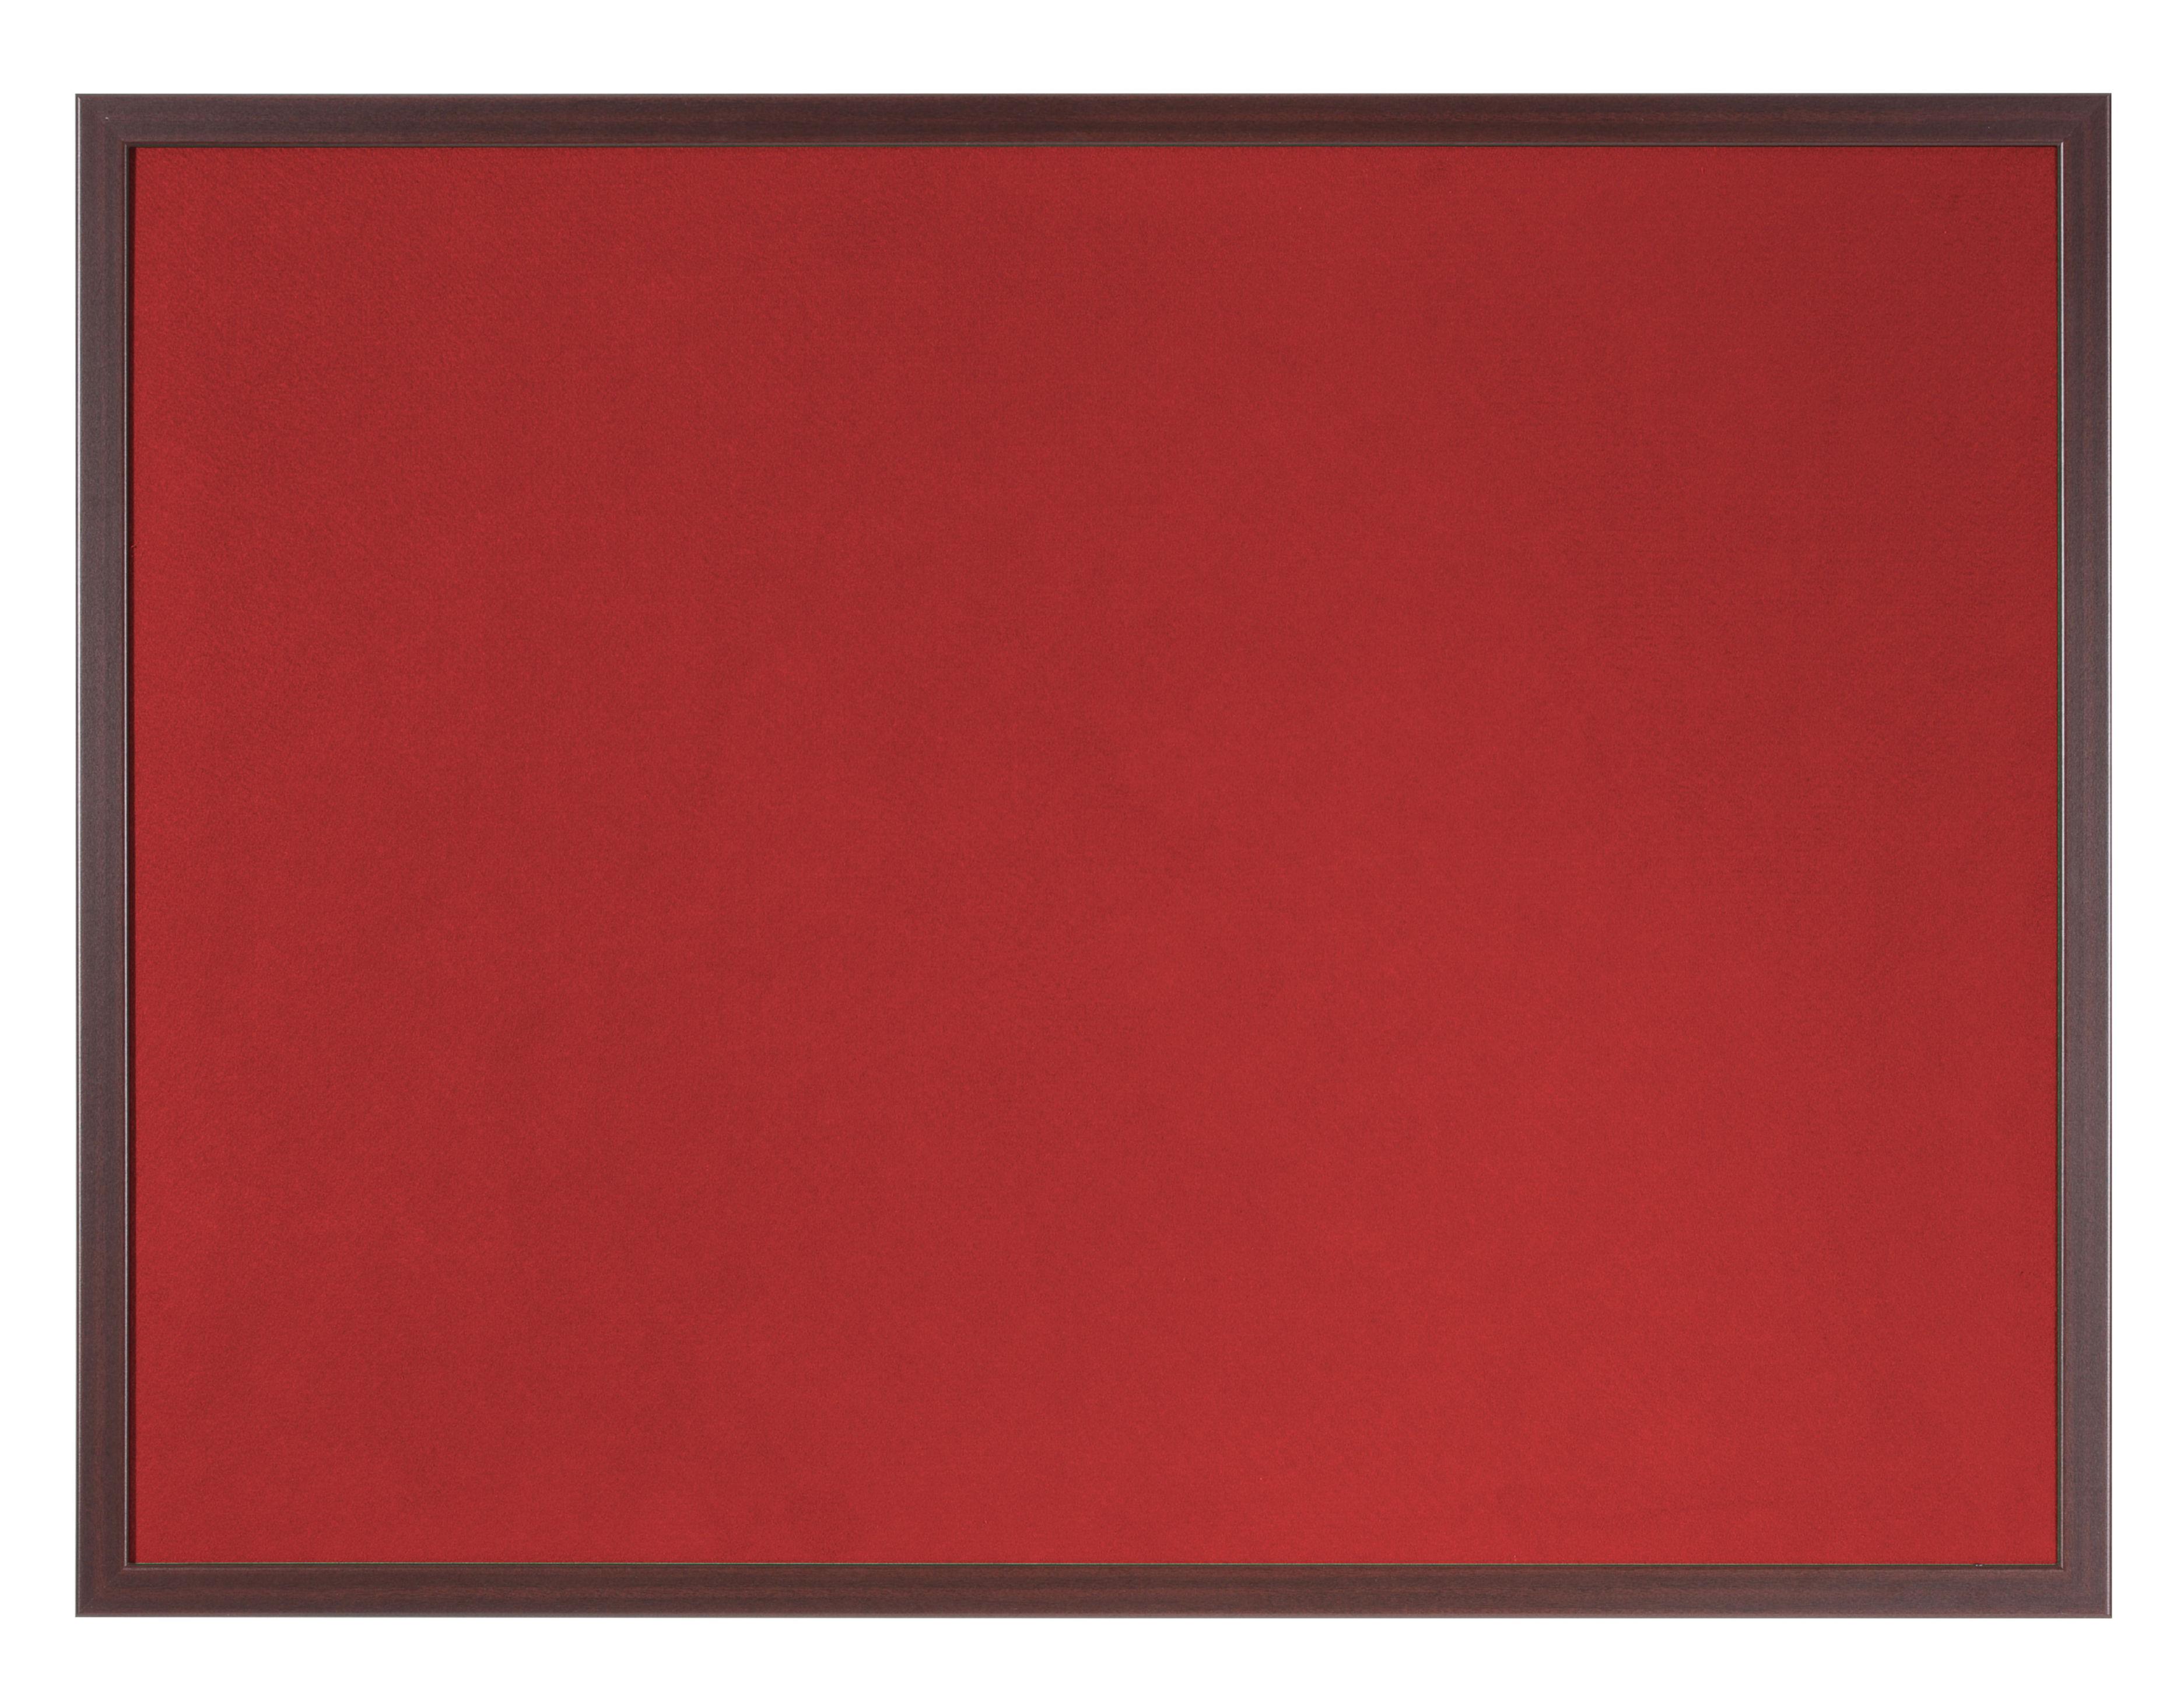 Felt Bi-Office Earth-It Red Felt Noticeboard Cherry Wood Frame 1800x1200mm